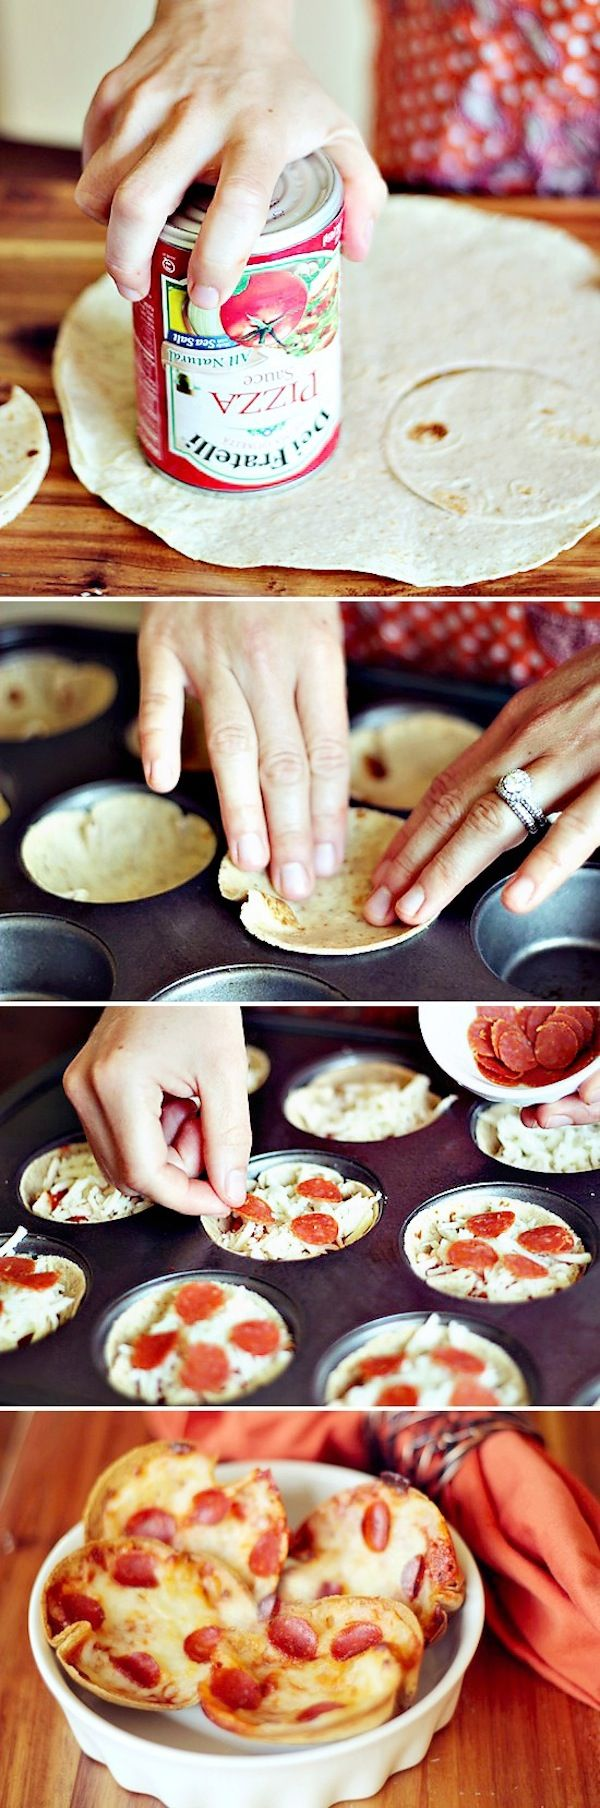 :D Recetas para niños: pizzas con pan ára